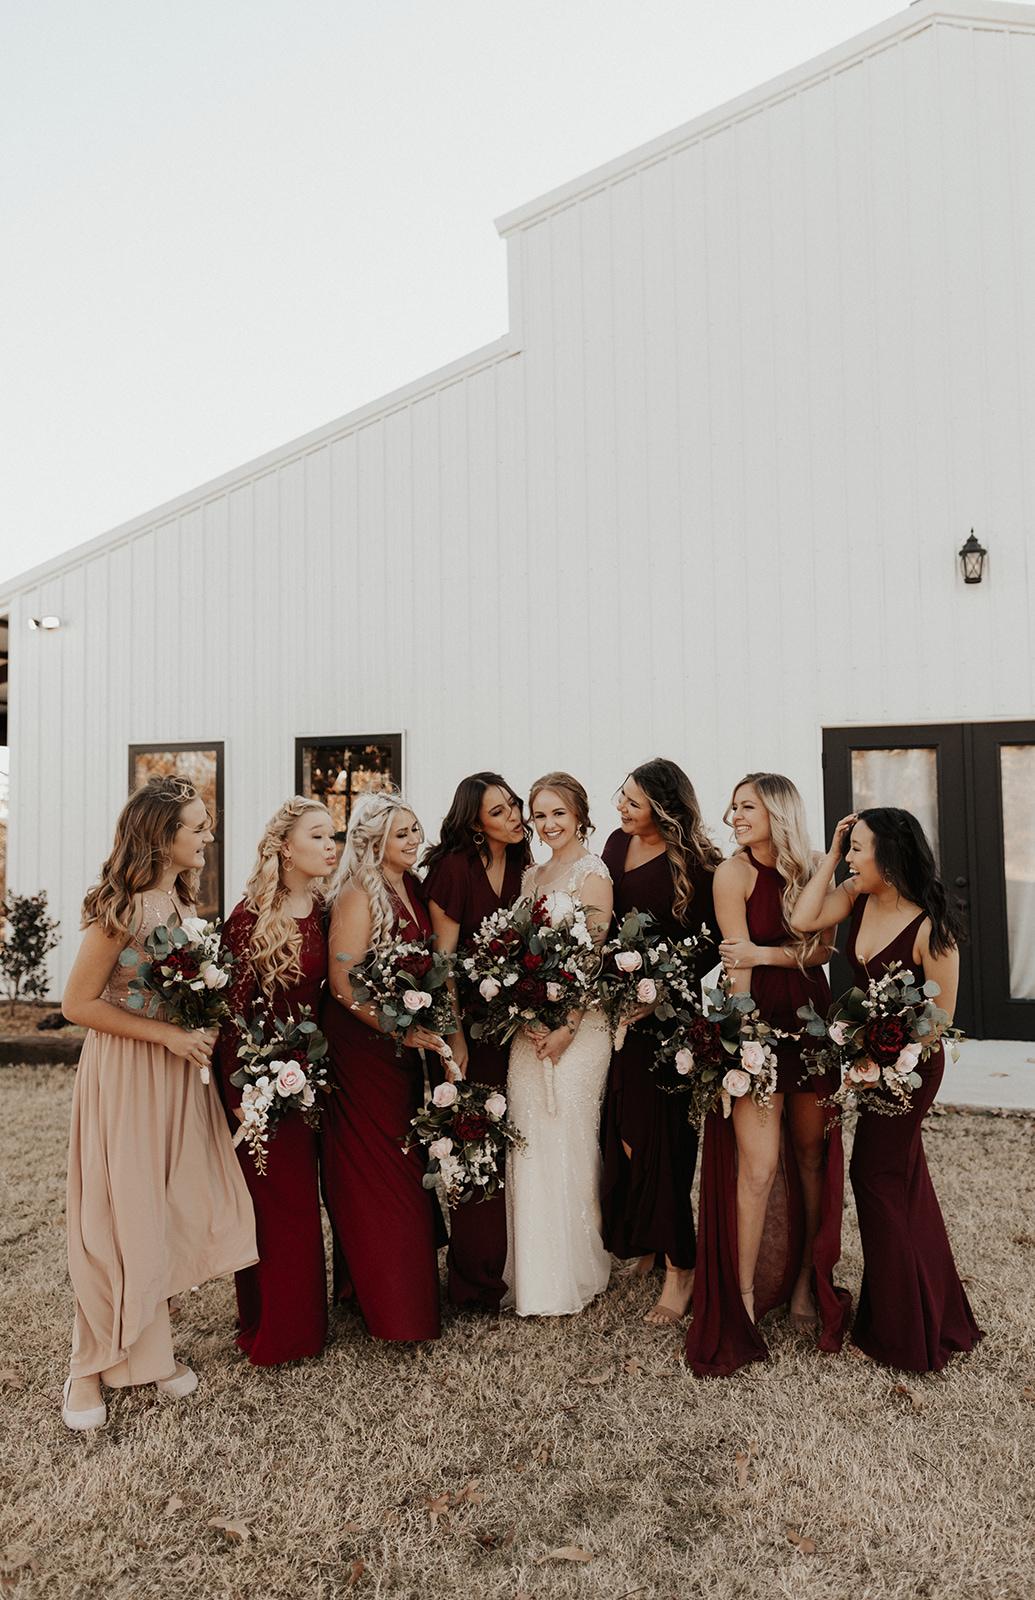 Best Wedding Venue in Tulsa Bixby Dream Point Ranch 20b.jpg